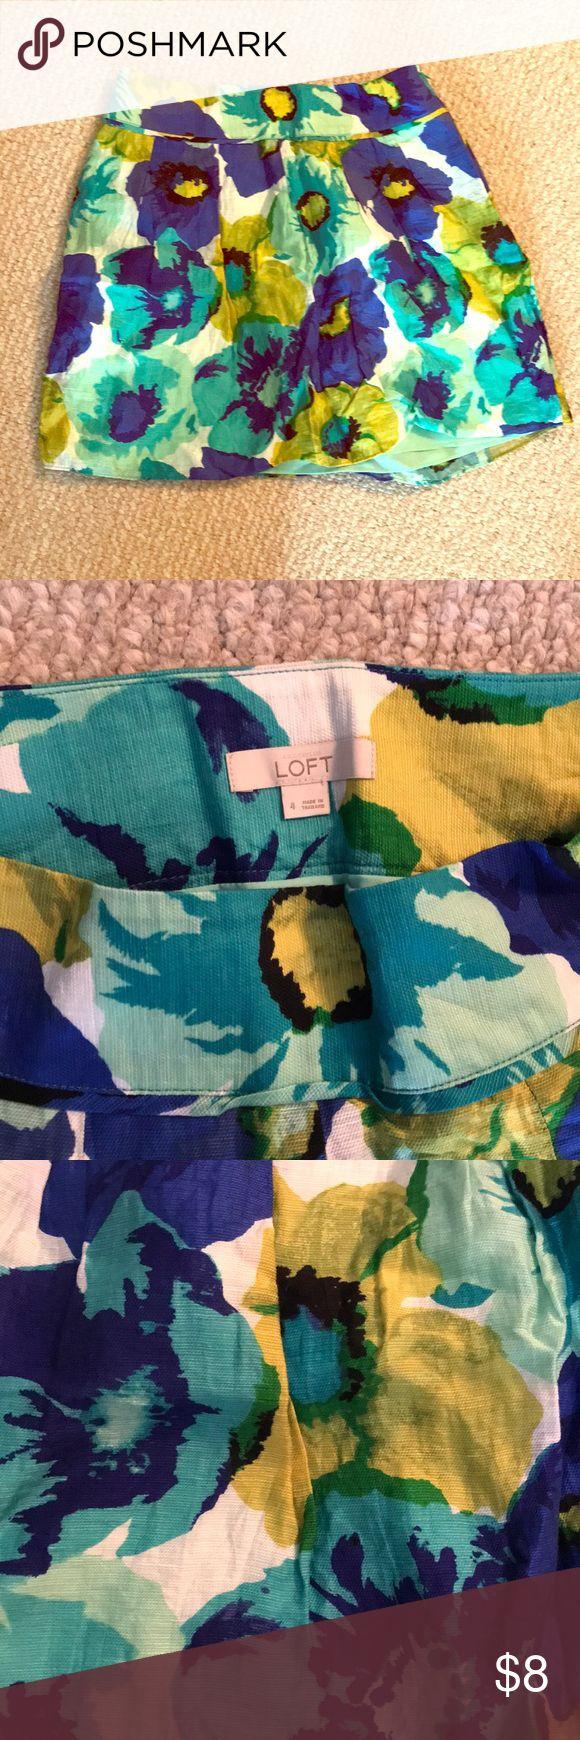 Ann Taylor Loft floral mini skirt Ann Taylor Loft blue + green floral mini skirt. Linen outer shell. 💙💚🌼 LOFT Skirts Mini